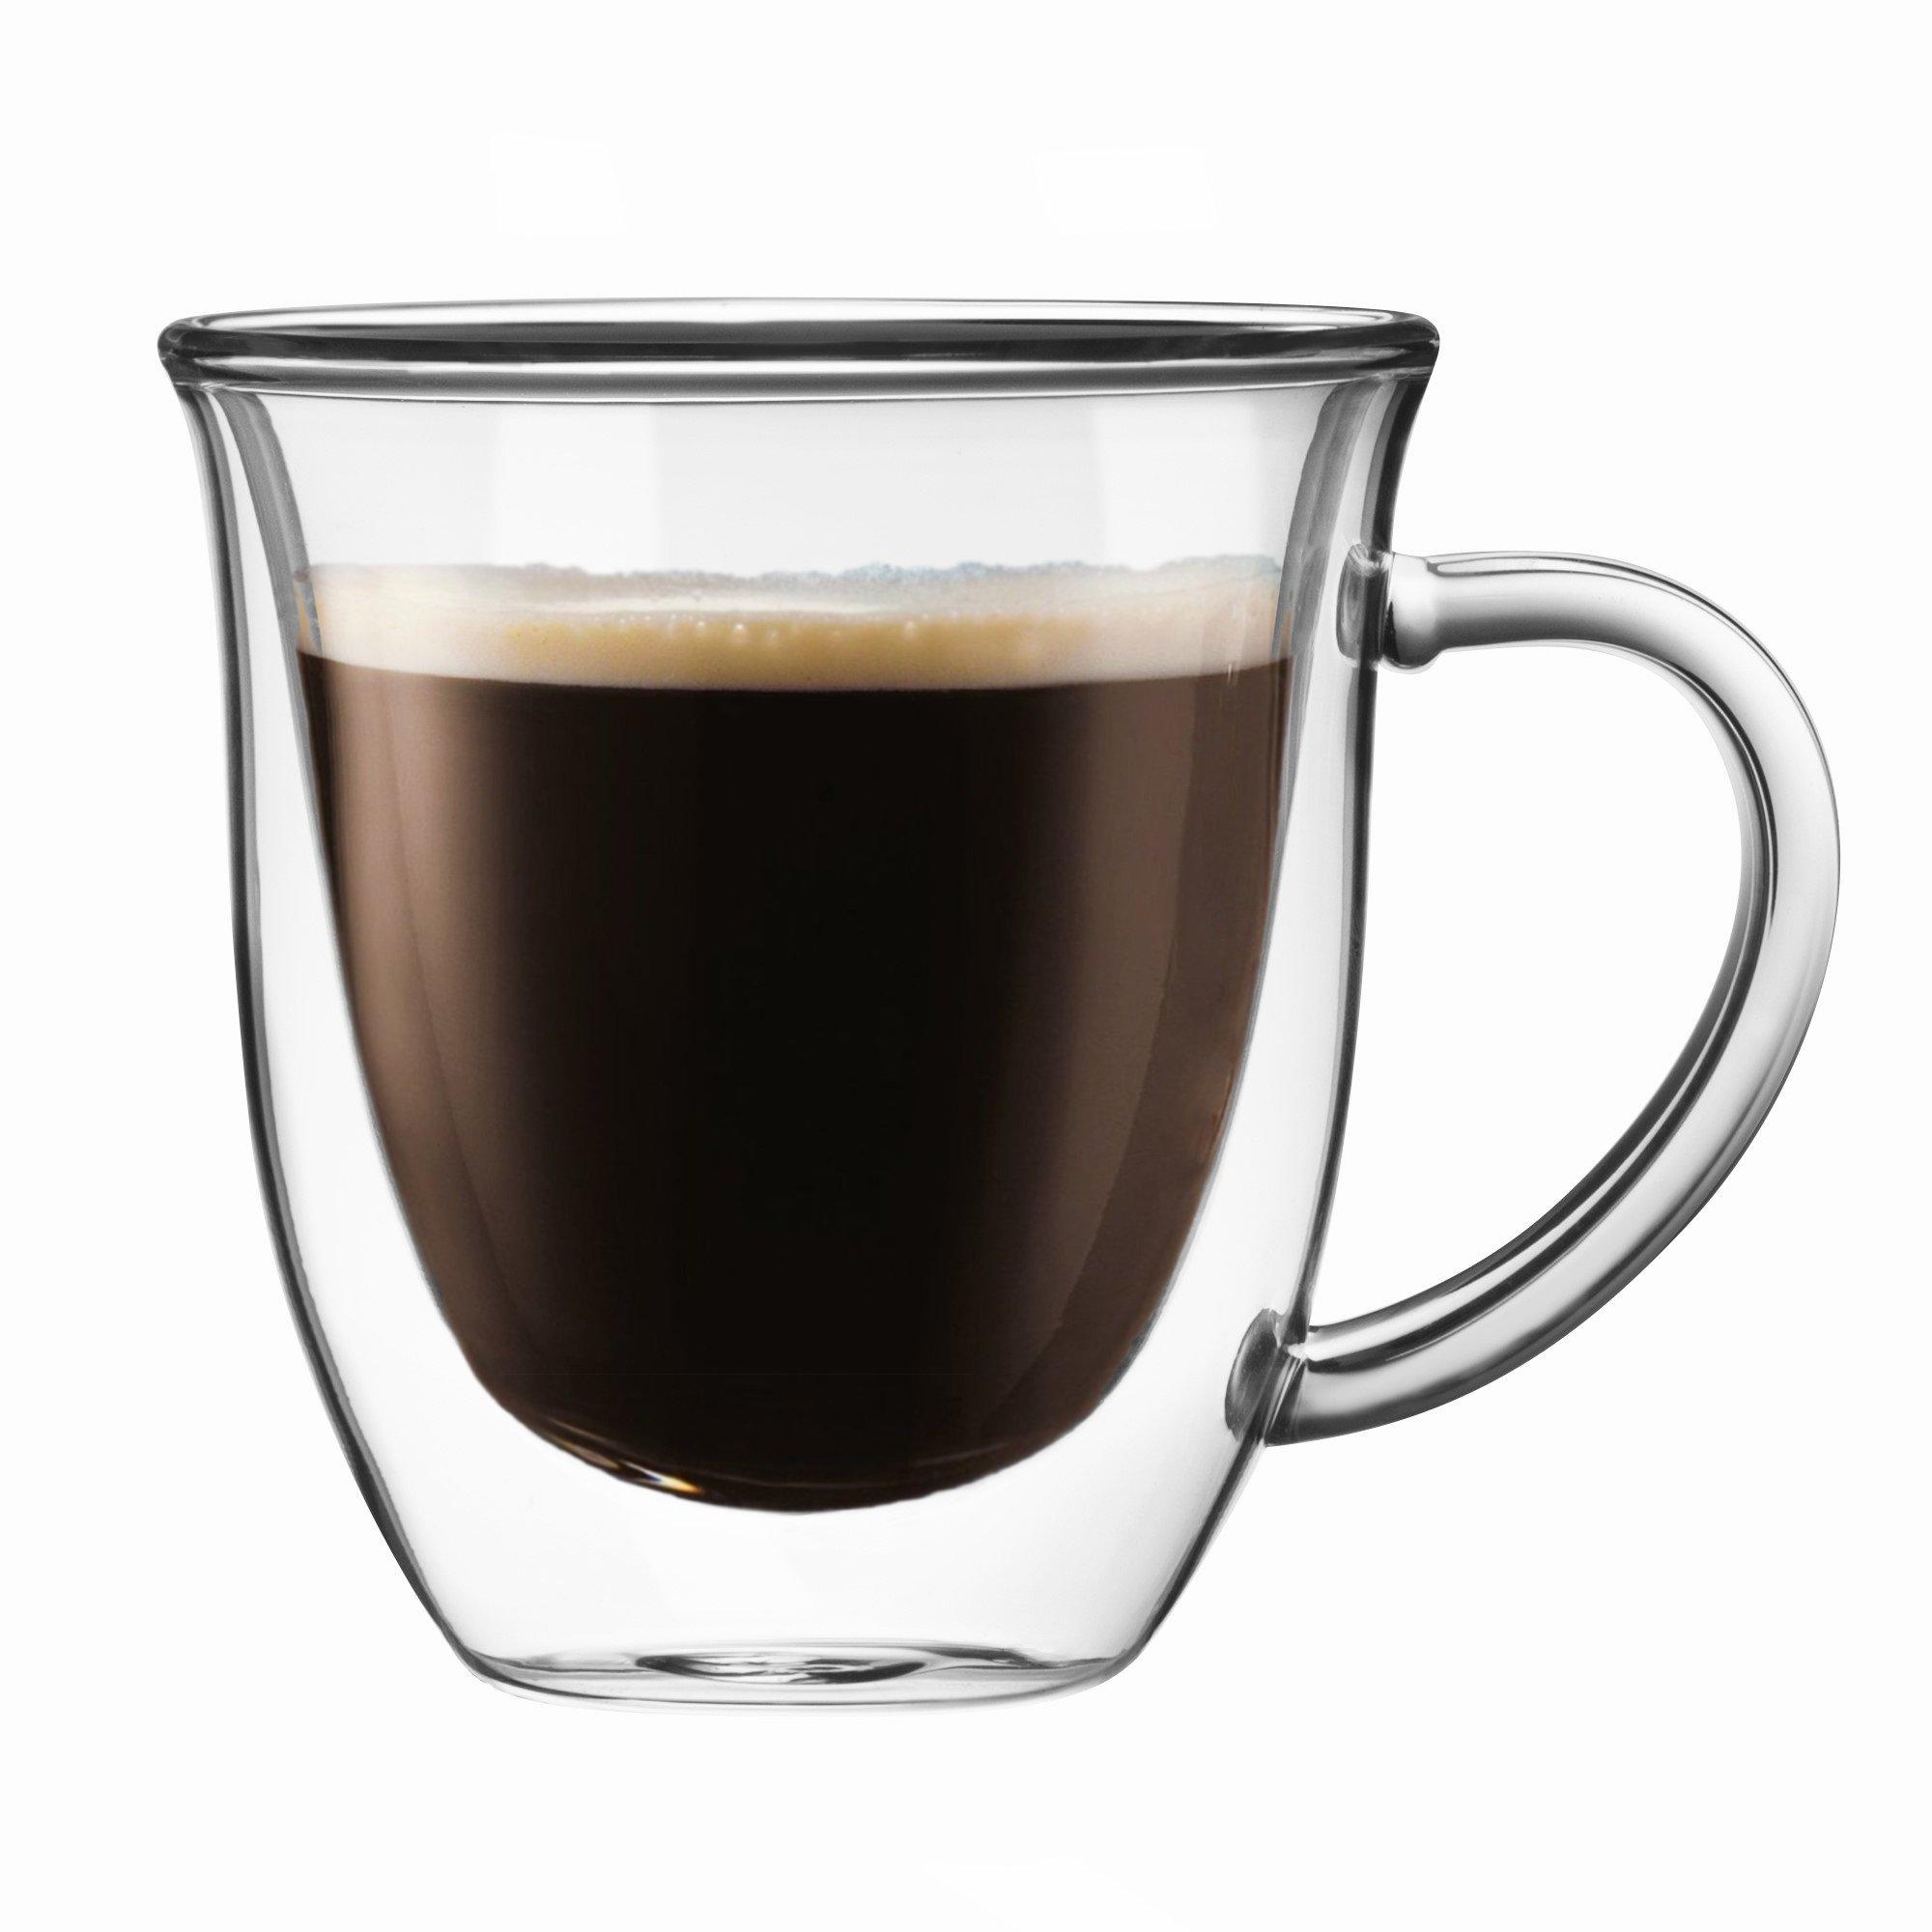 JoyJolt Serene Double Walled Insulated Glasses Coffee Mug (Set of 2) 7.4 Ounces by JoyJolt